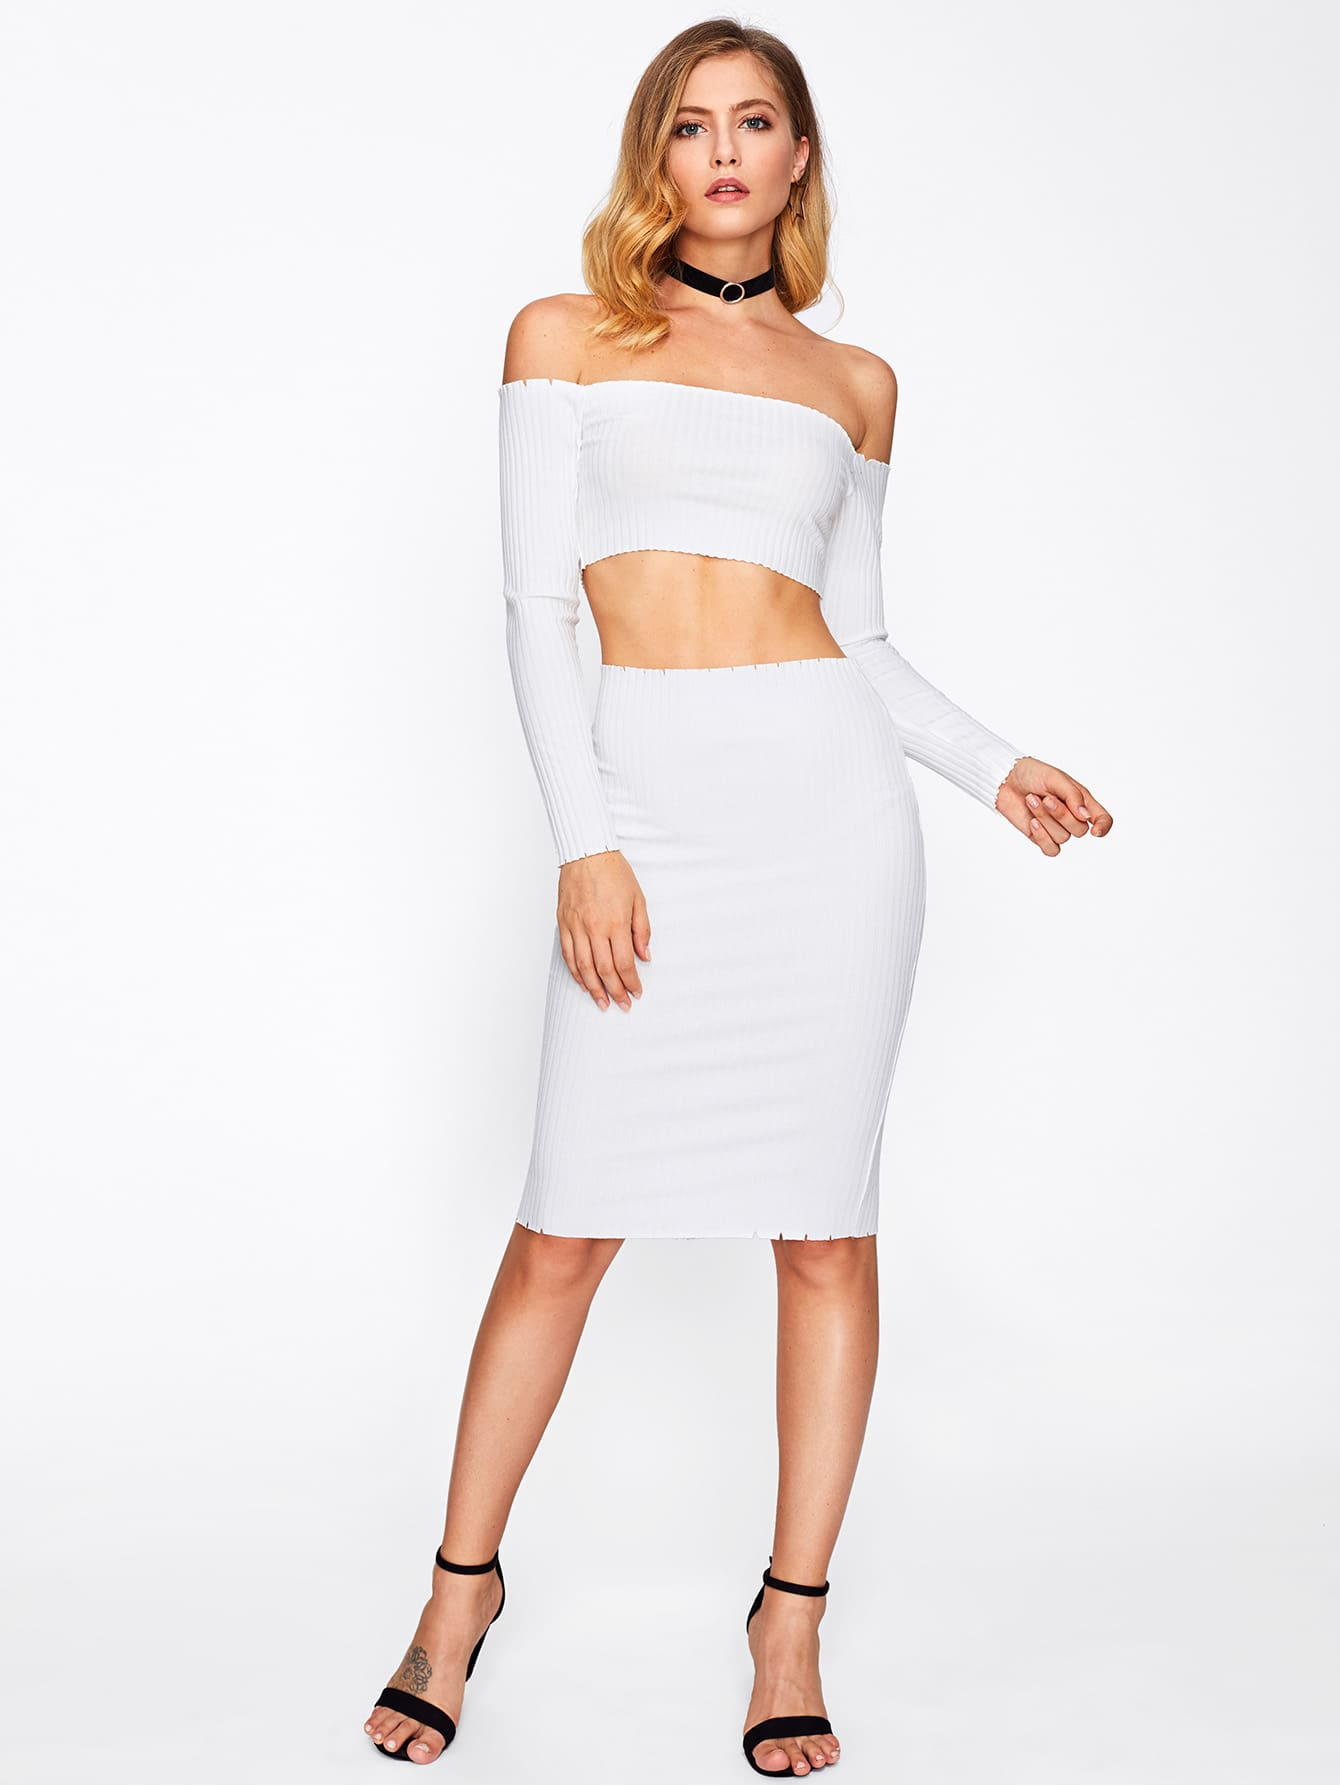 Off Shoulder Crop Top With Pencil Skirt